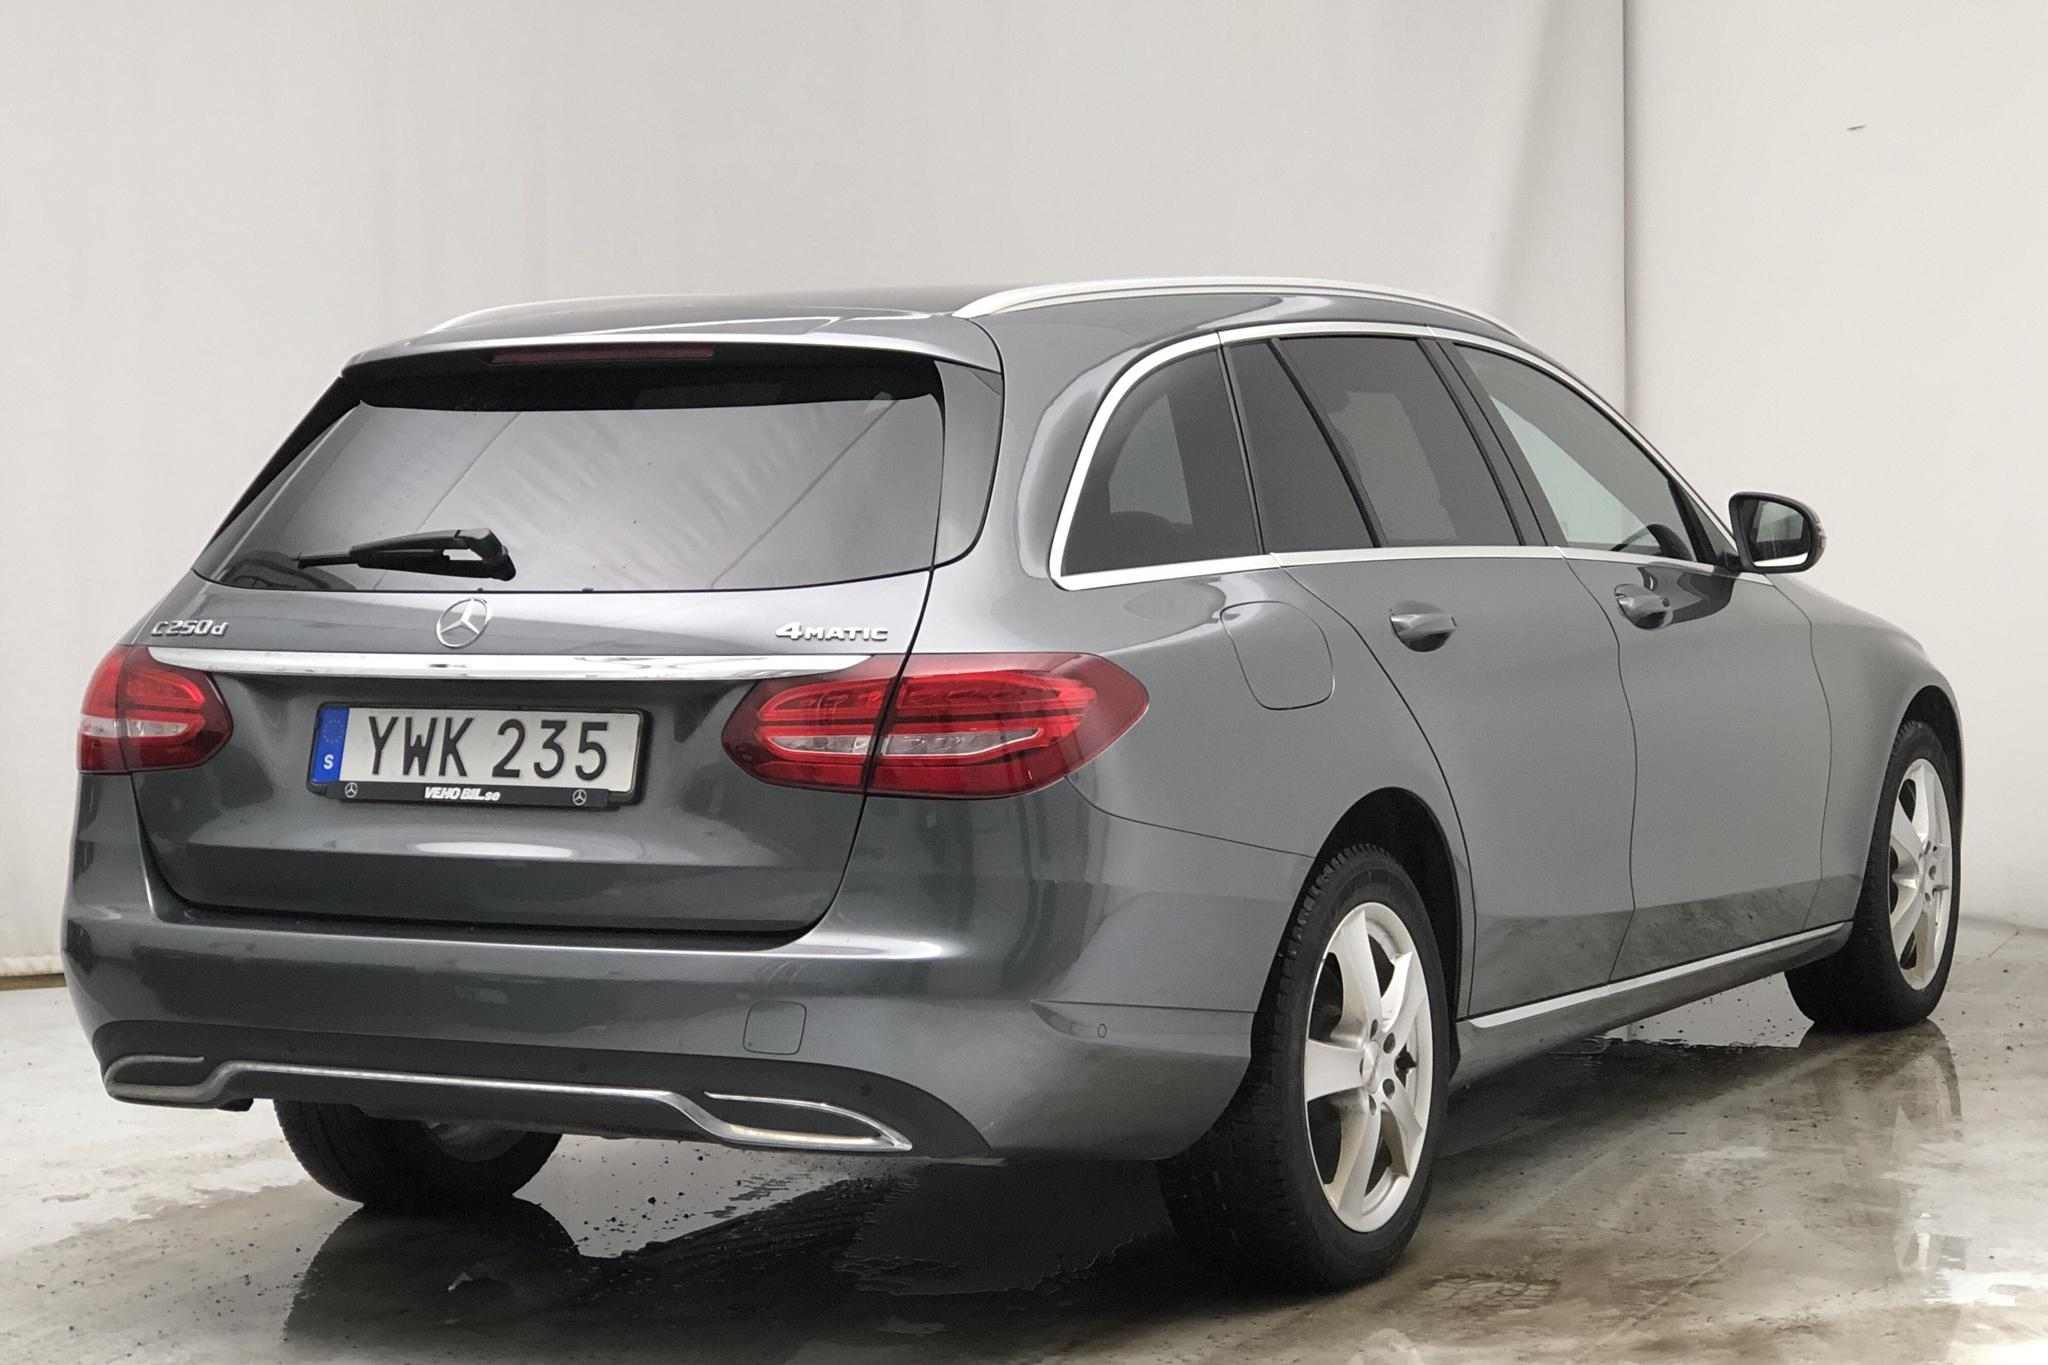 Mercedes C 250 d 4MATIC Kombi S205 (204hk) - 8 096 mil - Automat - grå - 2018